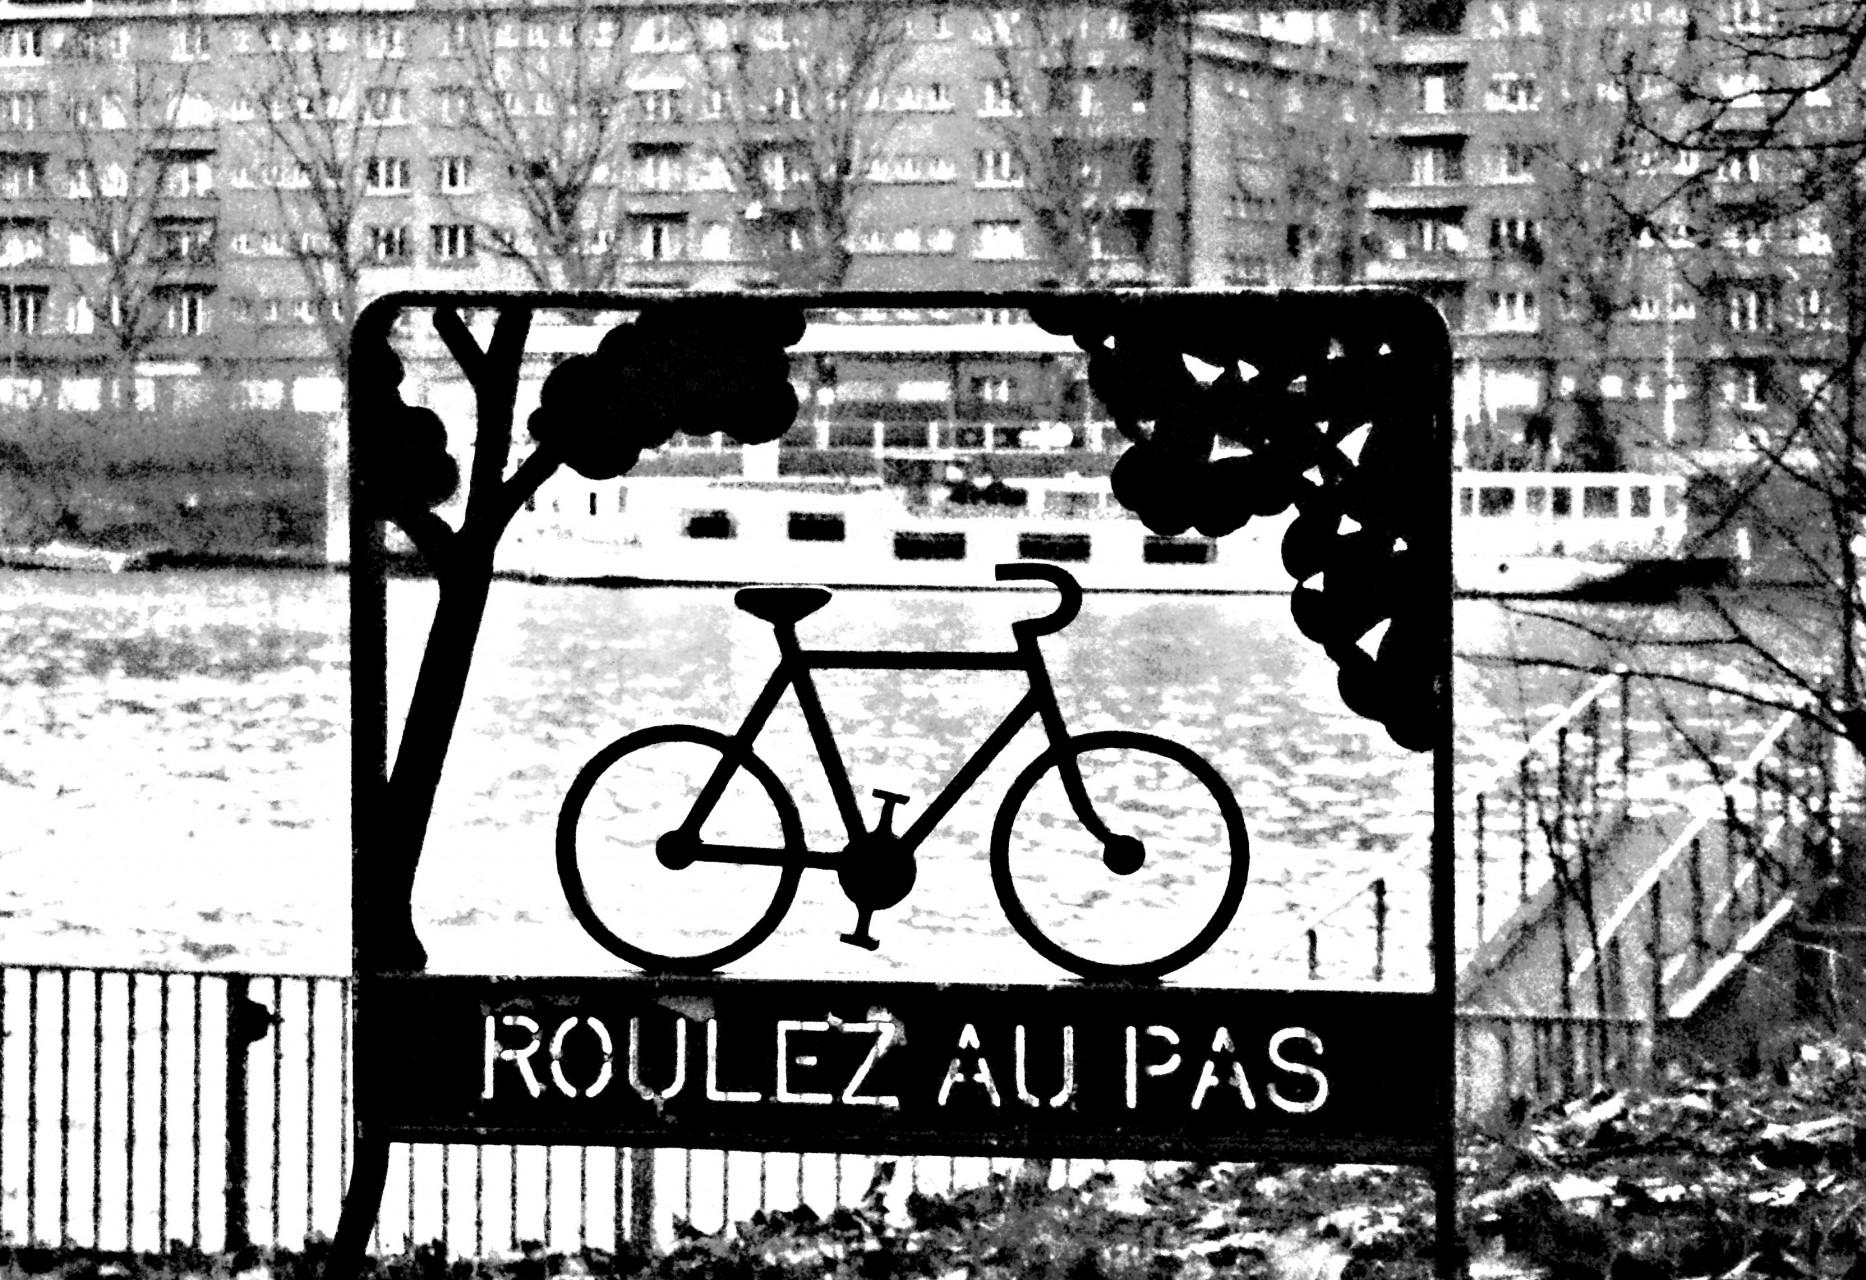 Boulogne - 2010